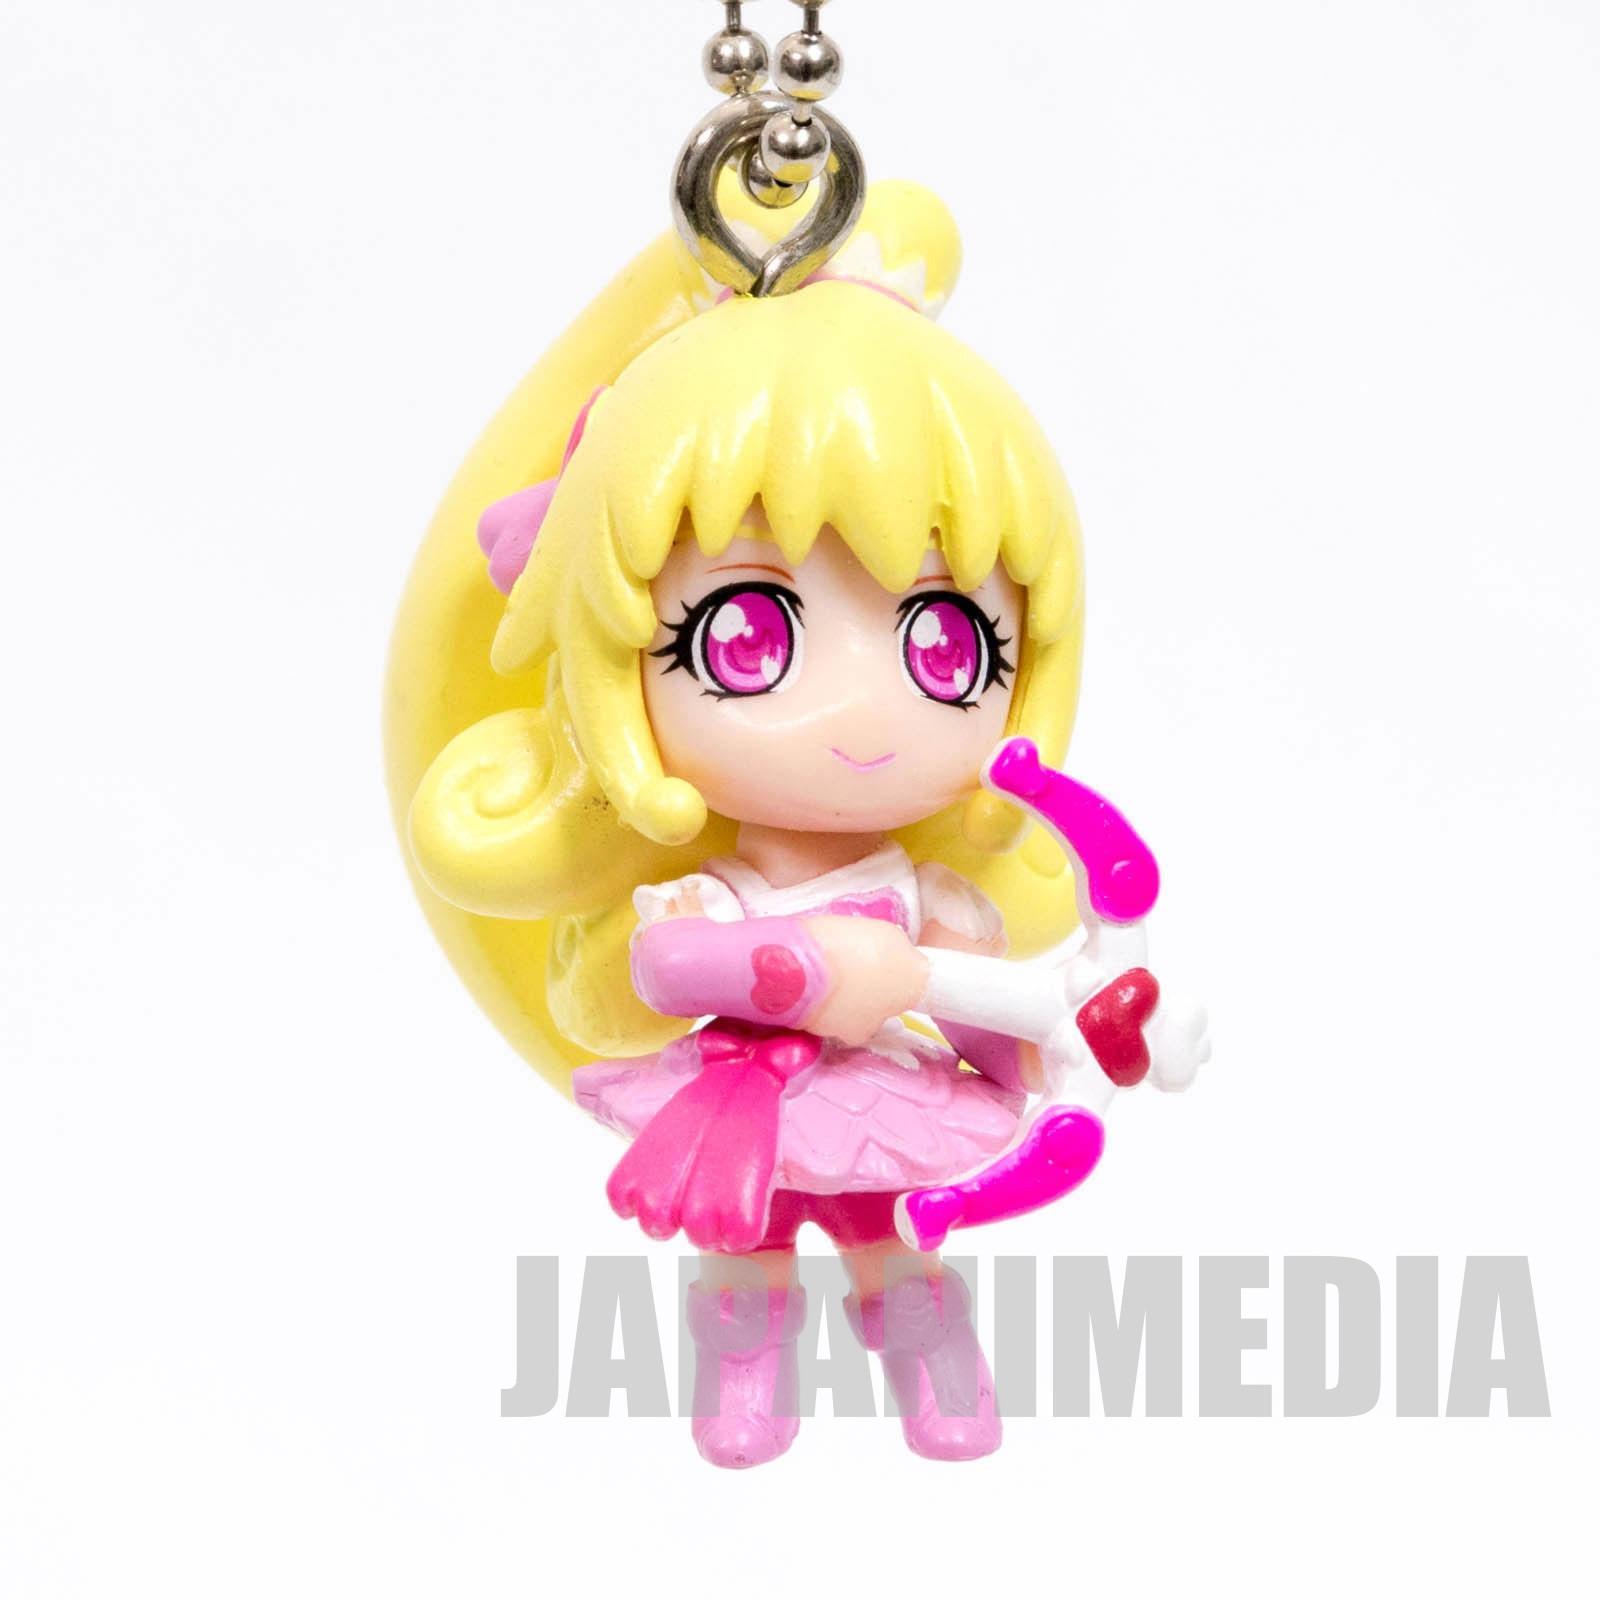 Doki Doki! PreCure Cure Heart Doki Doki Precure swing Mascot Figure Ball Keychain JAPAN ANIME